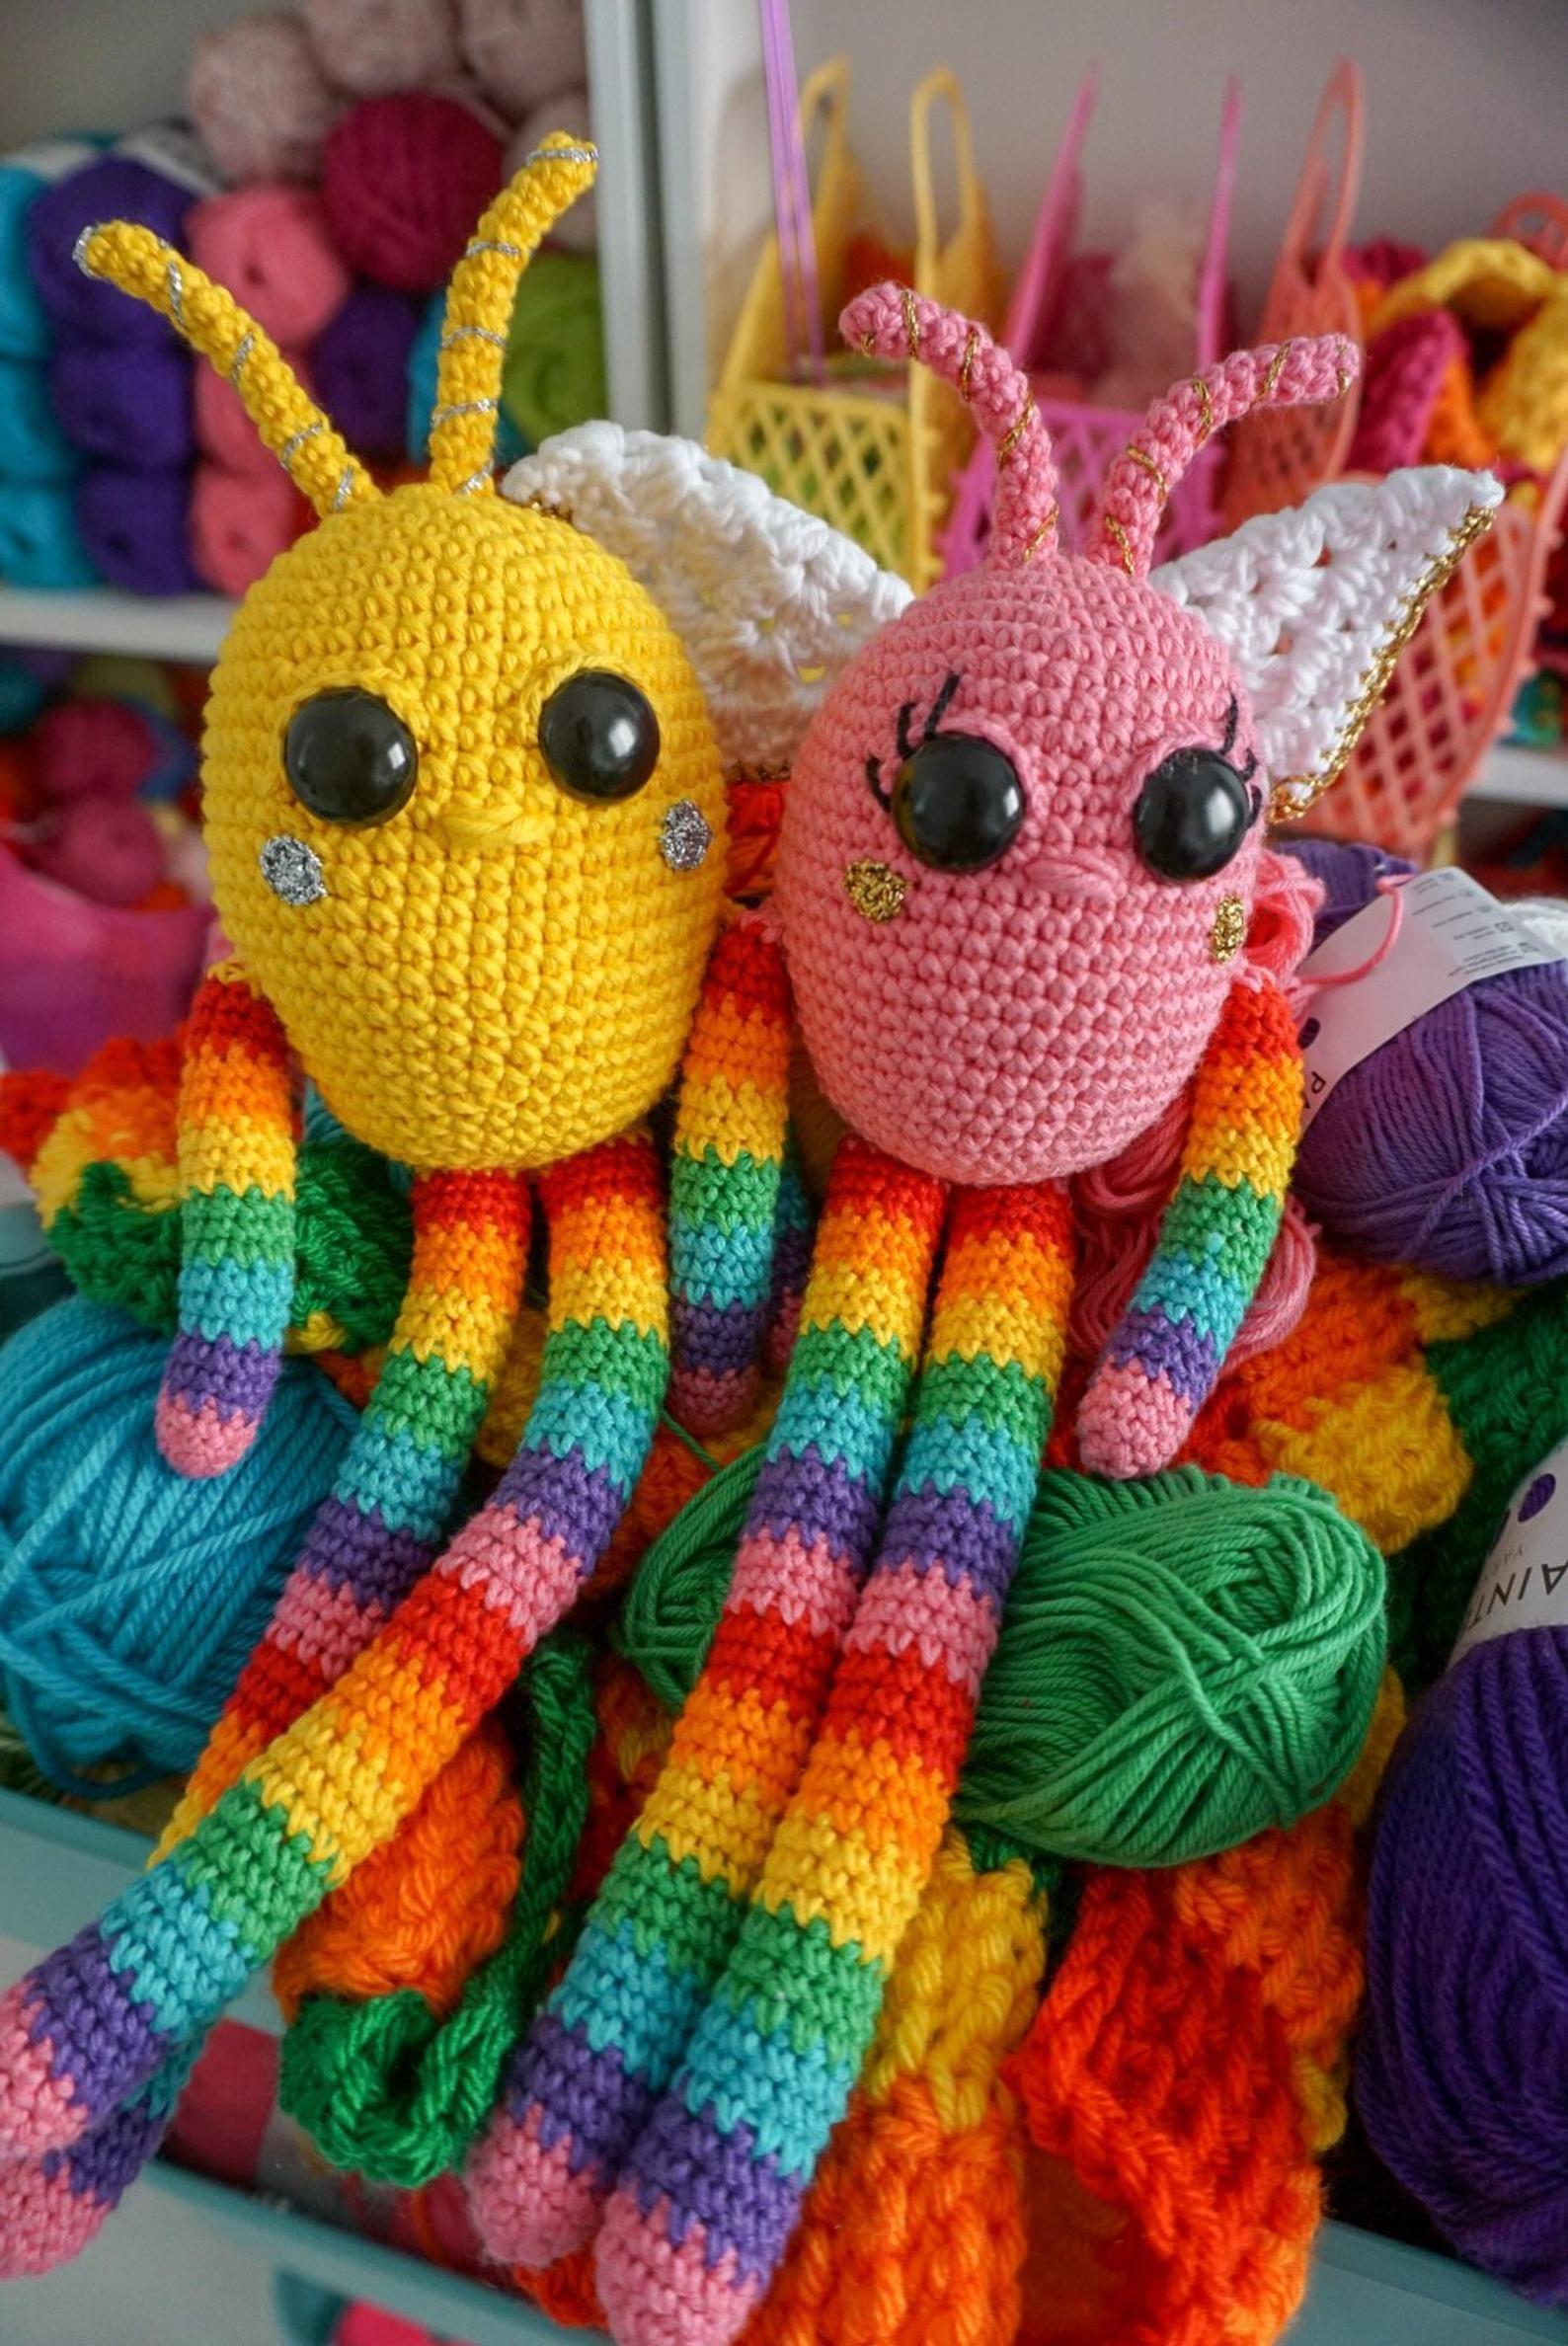 Amigurumi Pattern Rainbow Snuggle Bugs Amigurumi